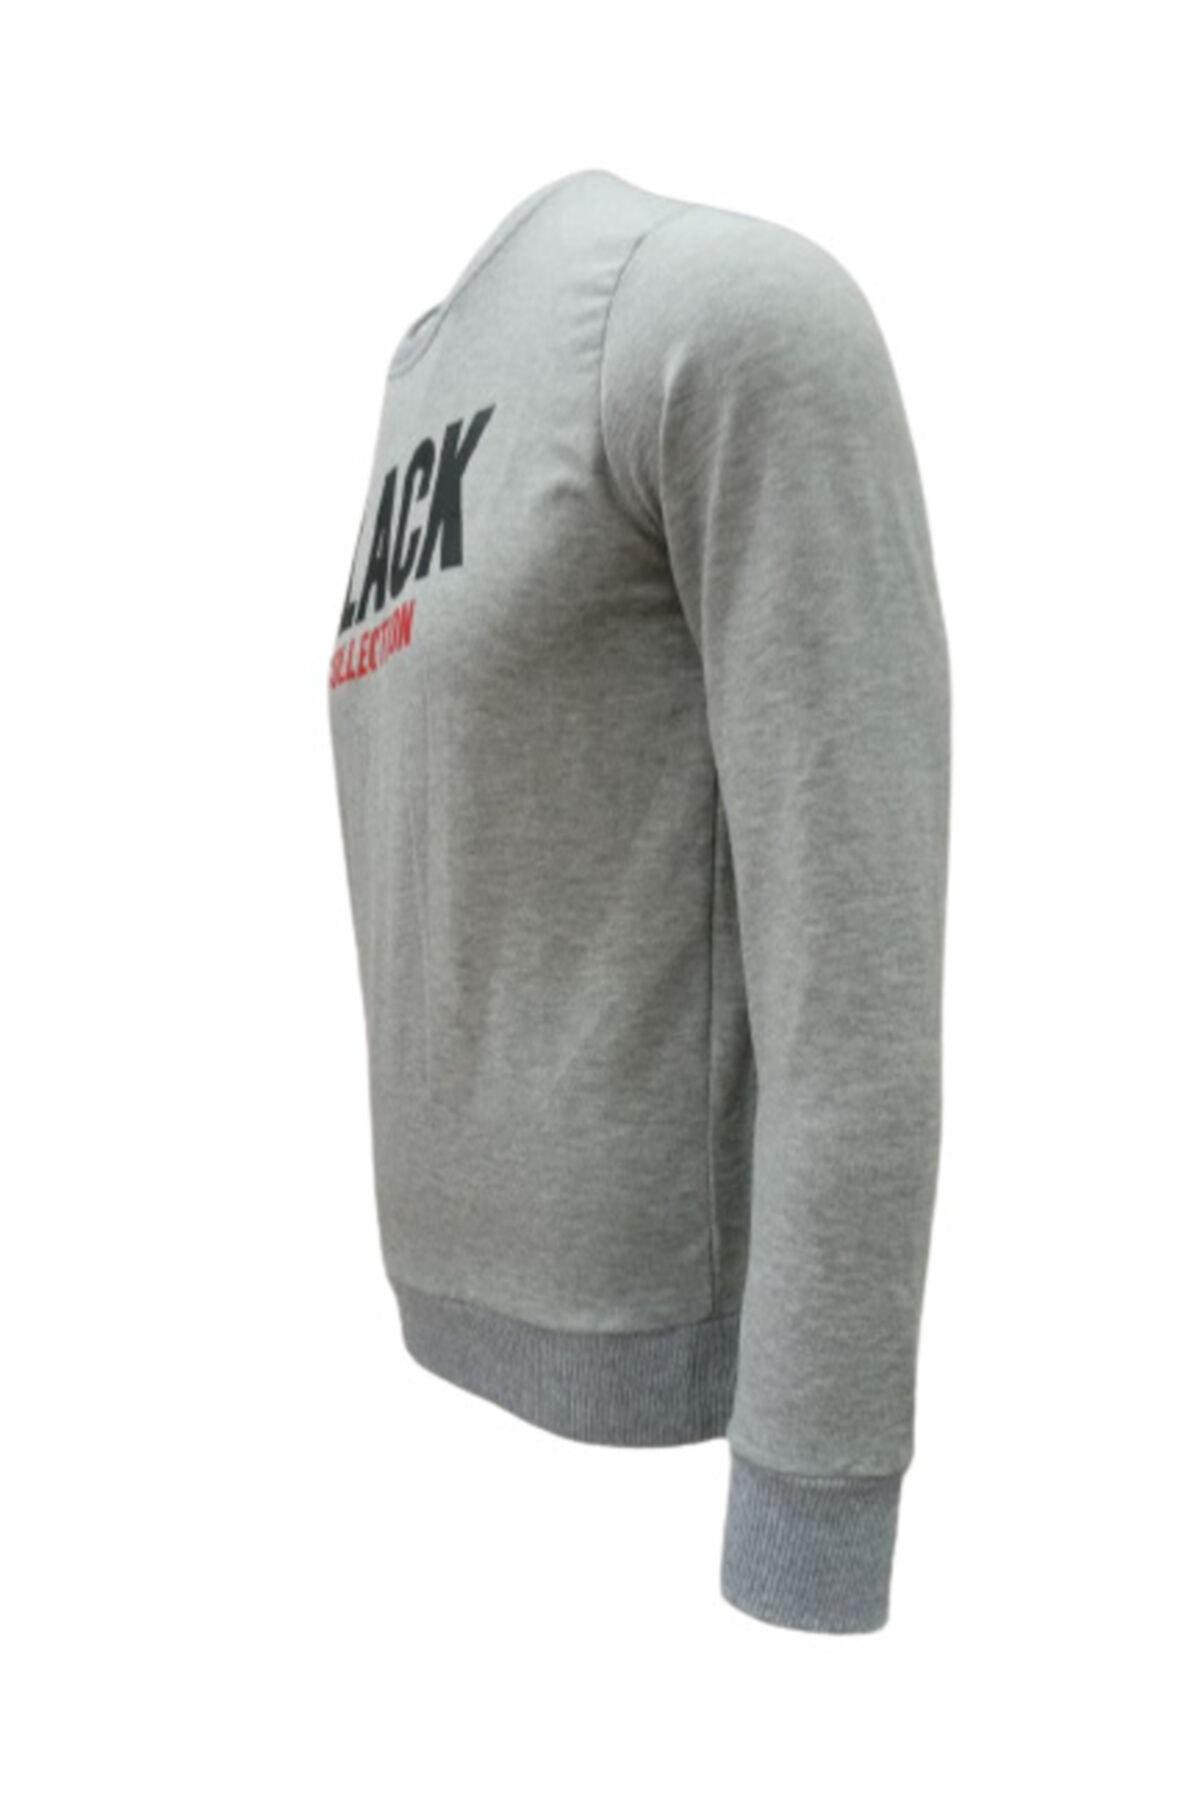 BOSS MİLANO Erkek Gri Sweatshirt Slim Fit (DAR KALIP)